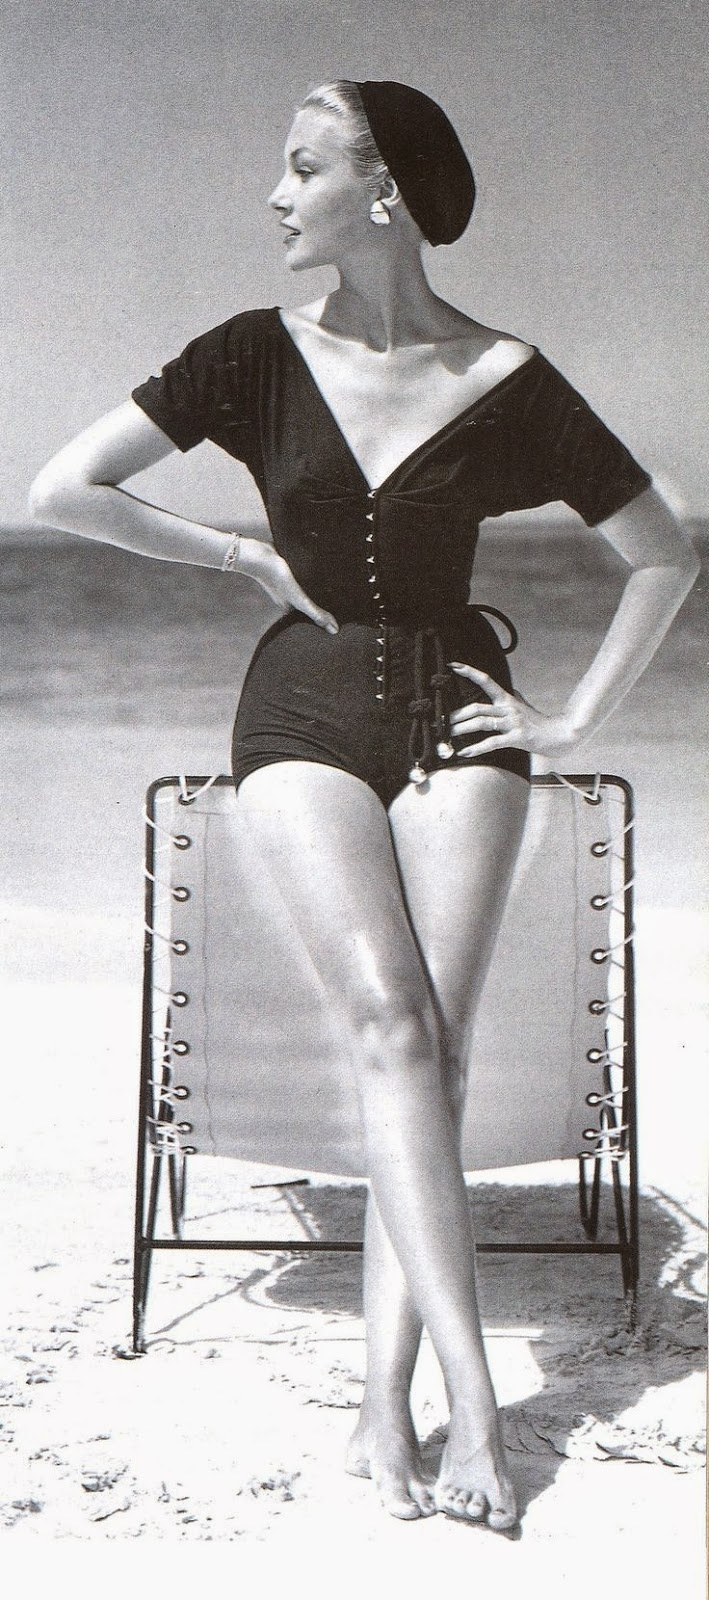 Claire McCardell 1953 Source: www.missdandy77.blogspot.com